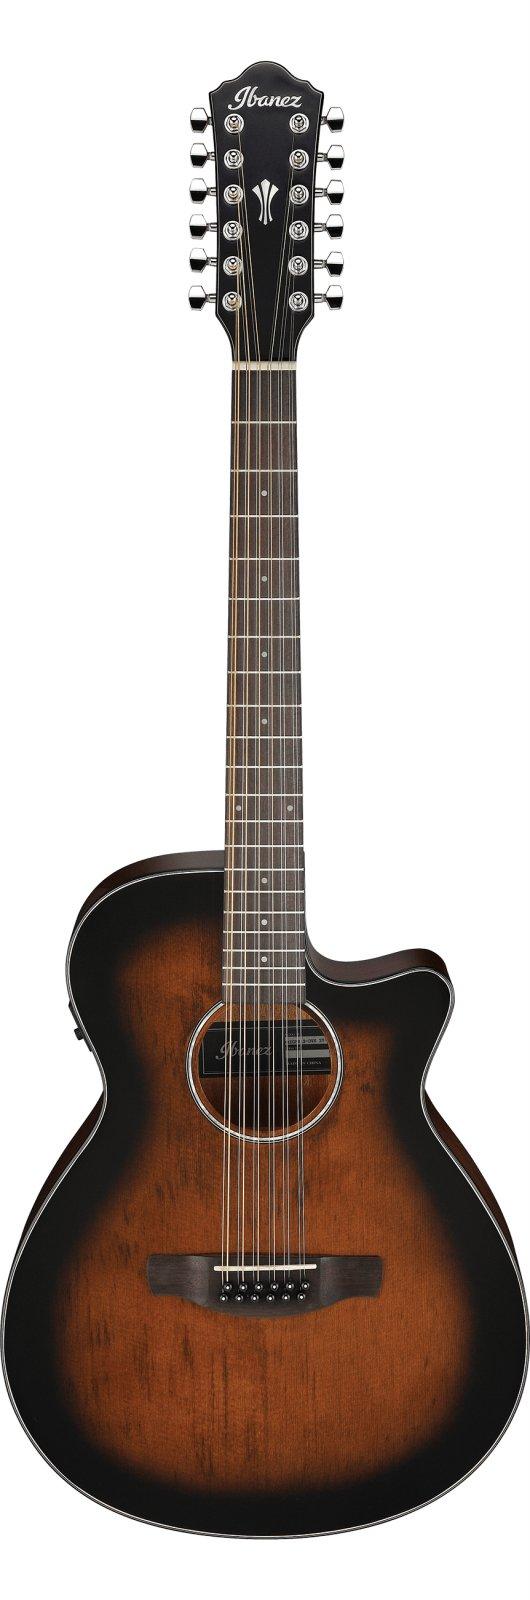 Ibanez AEG 12-String Acoustic-Electric Guitar - Dark Violin Sunburst